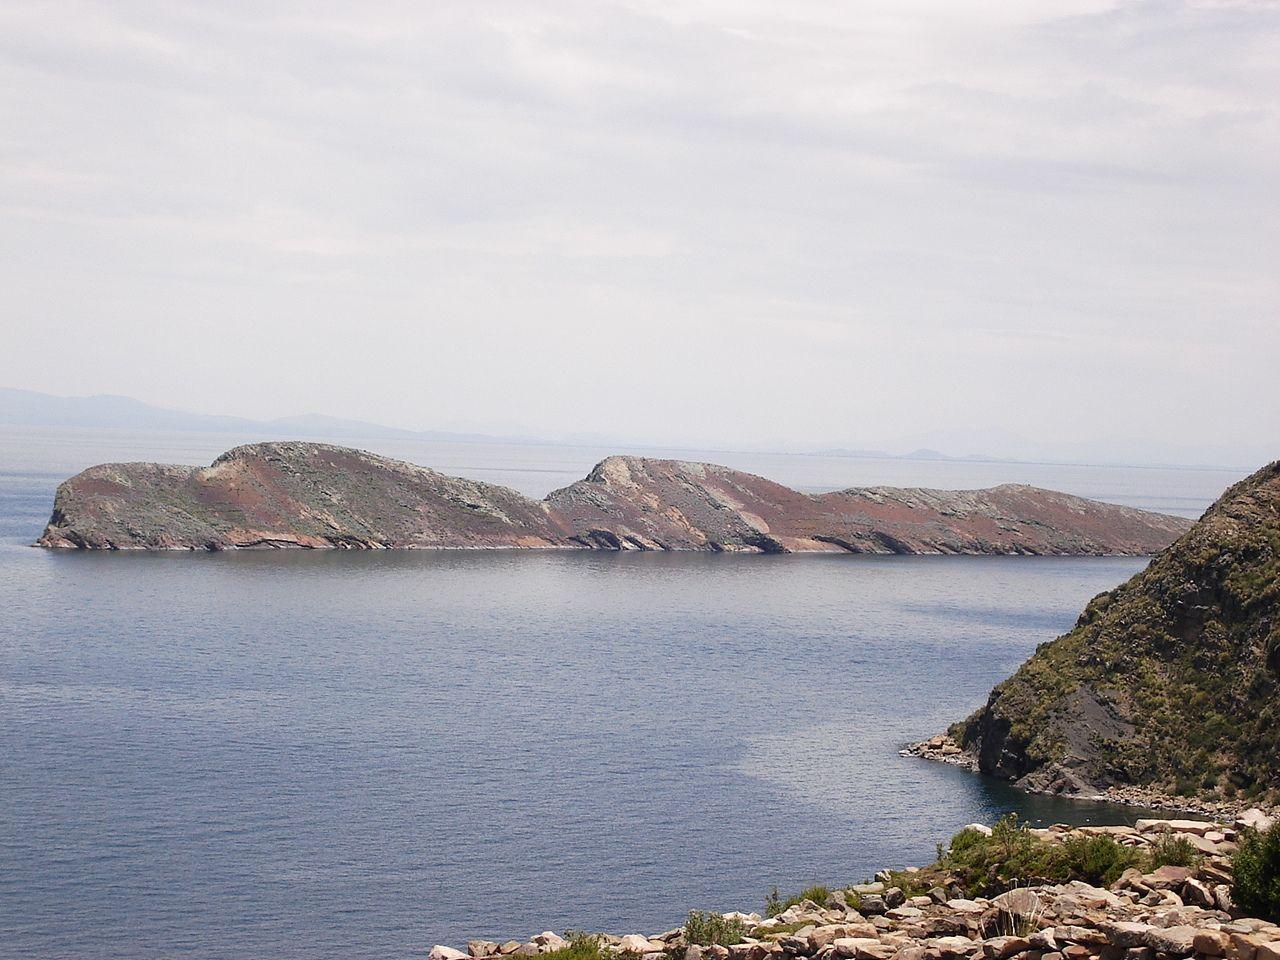 Lake Titicaca By Alexson Scheppa Peisino(AlexSP) (Own work) [Public domain], via Wikimedia Commons